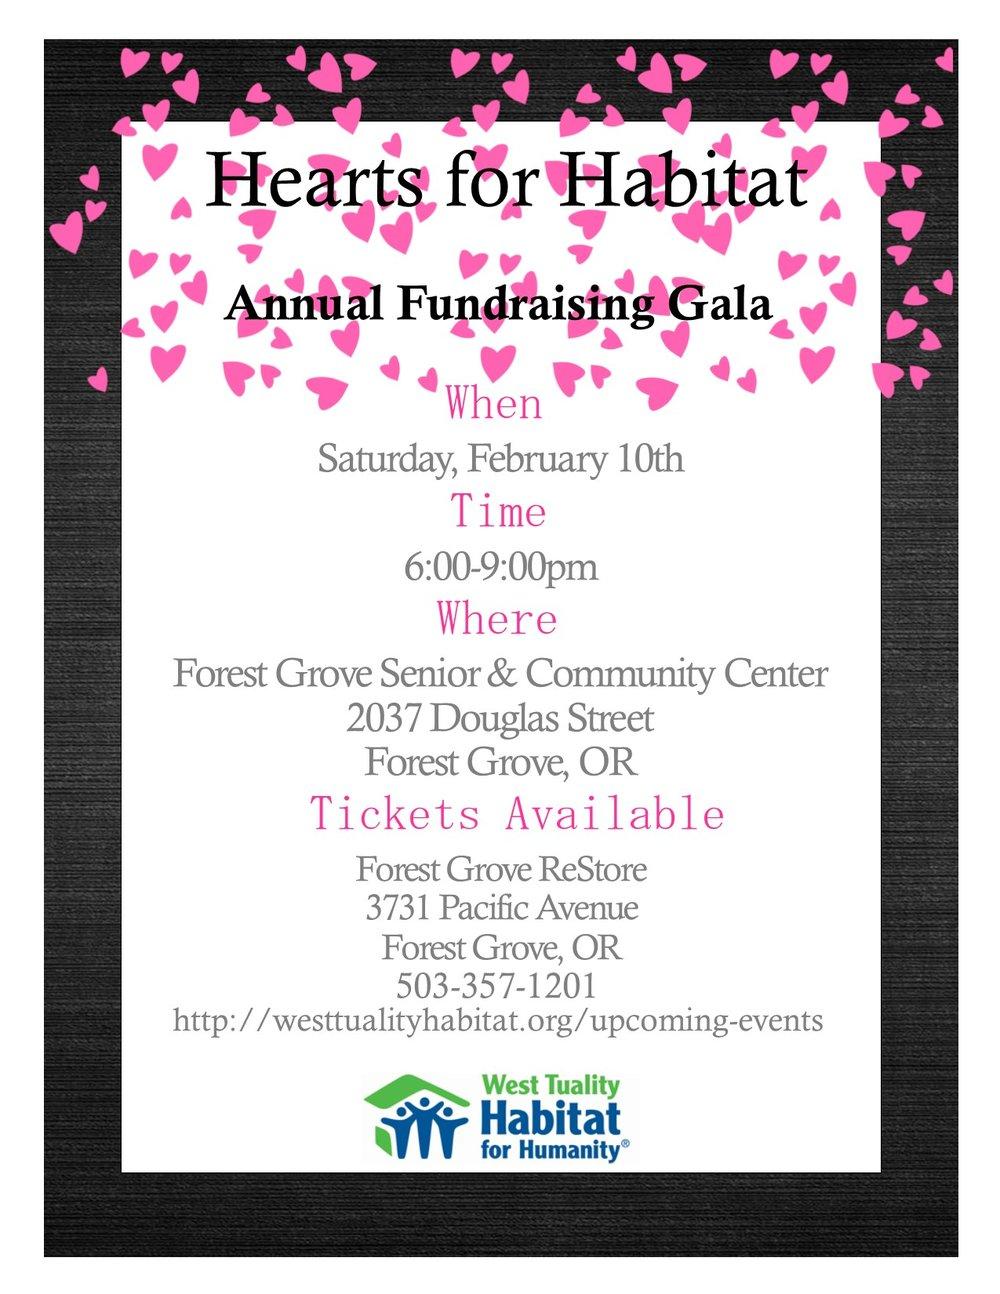 Hearts-for-Habitat-Flyer.jpg